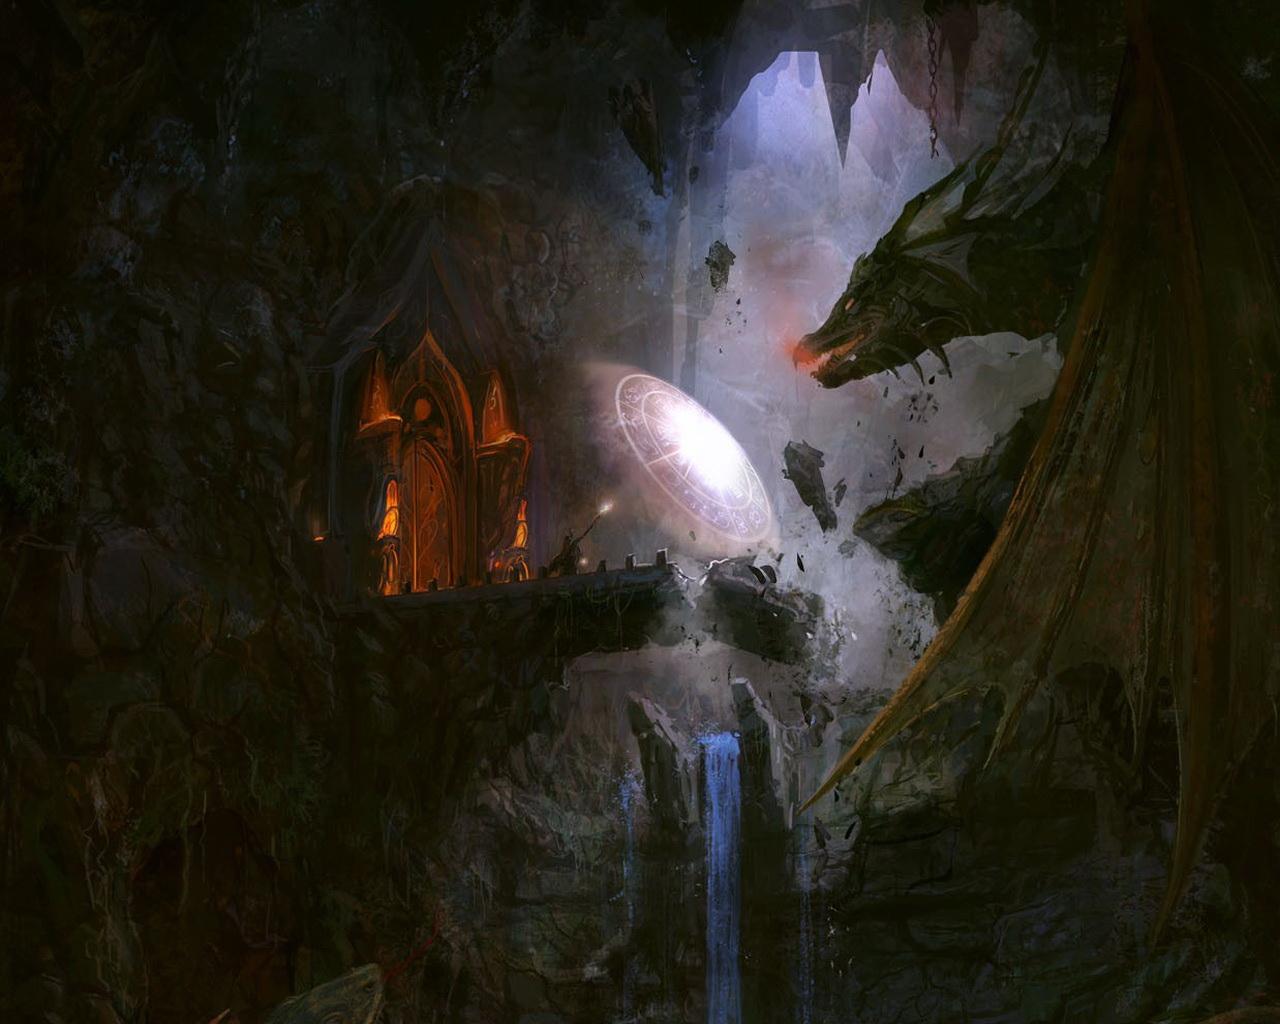 dragon wizard battle art desktop 1280x1024 free wallpaper 33728 1280x1024